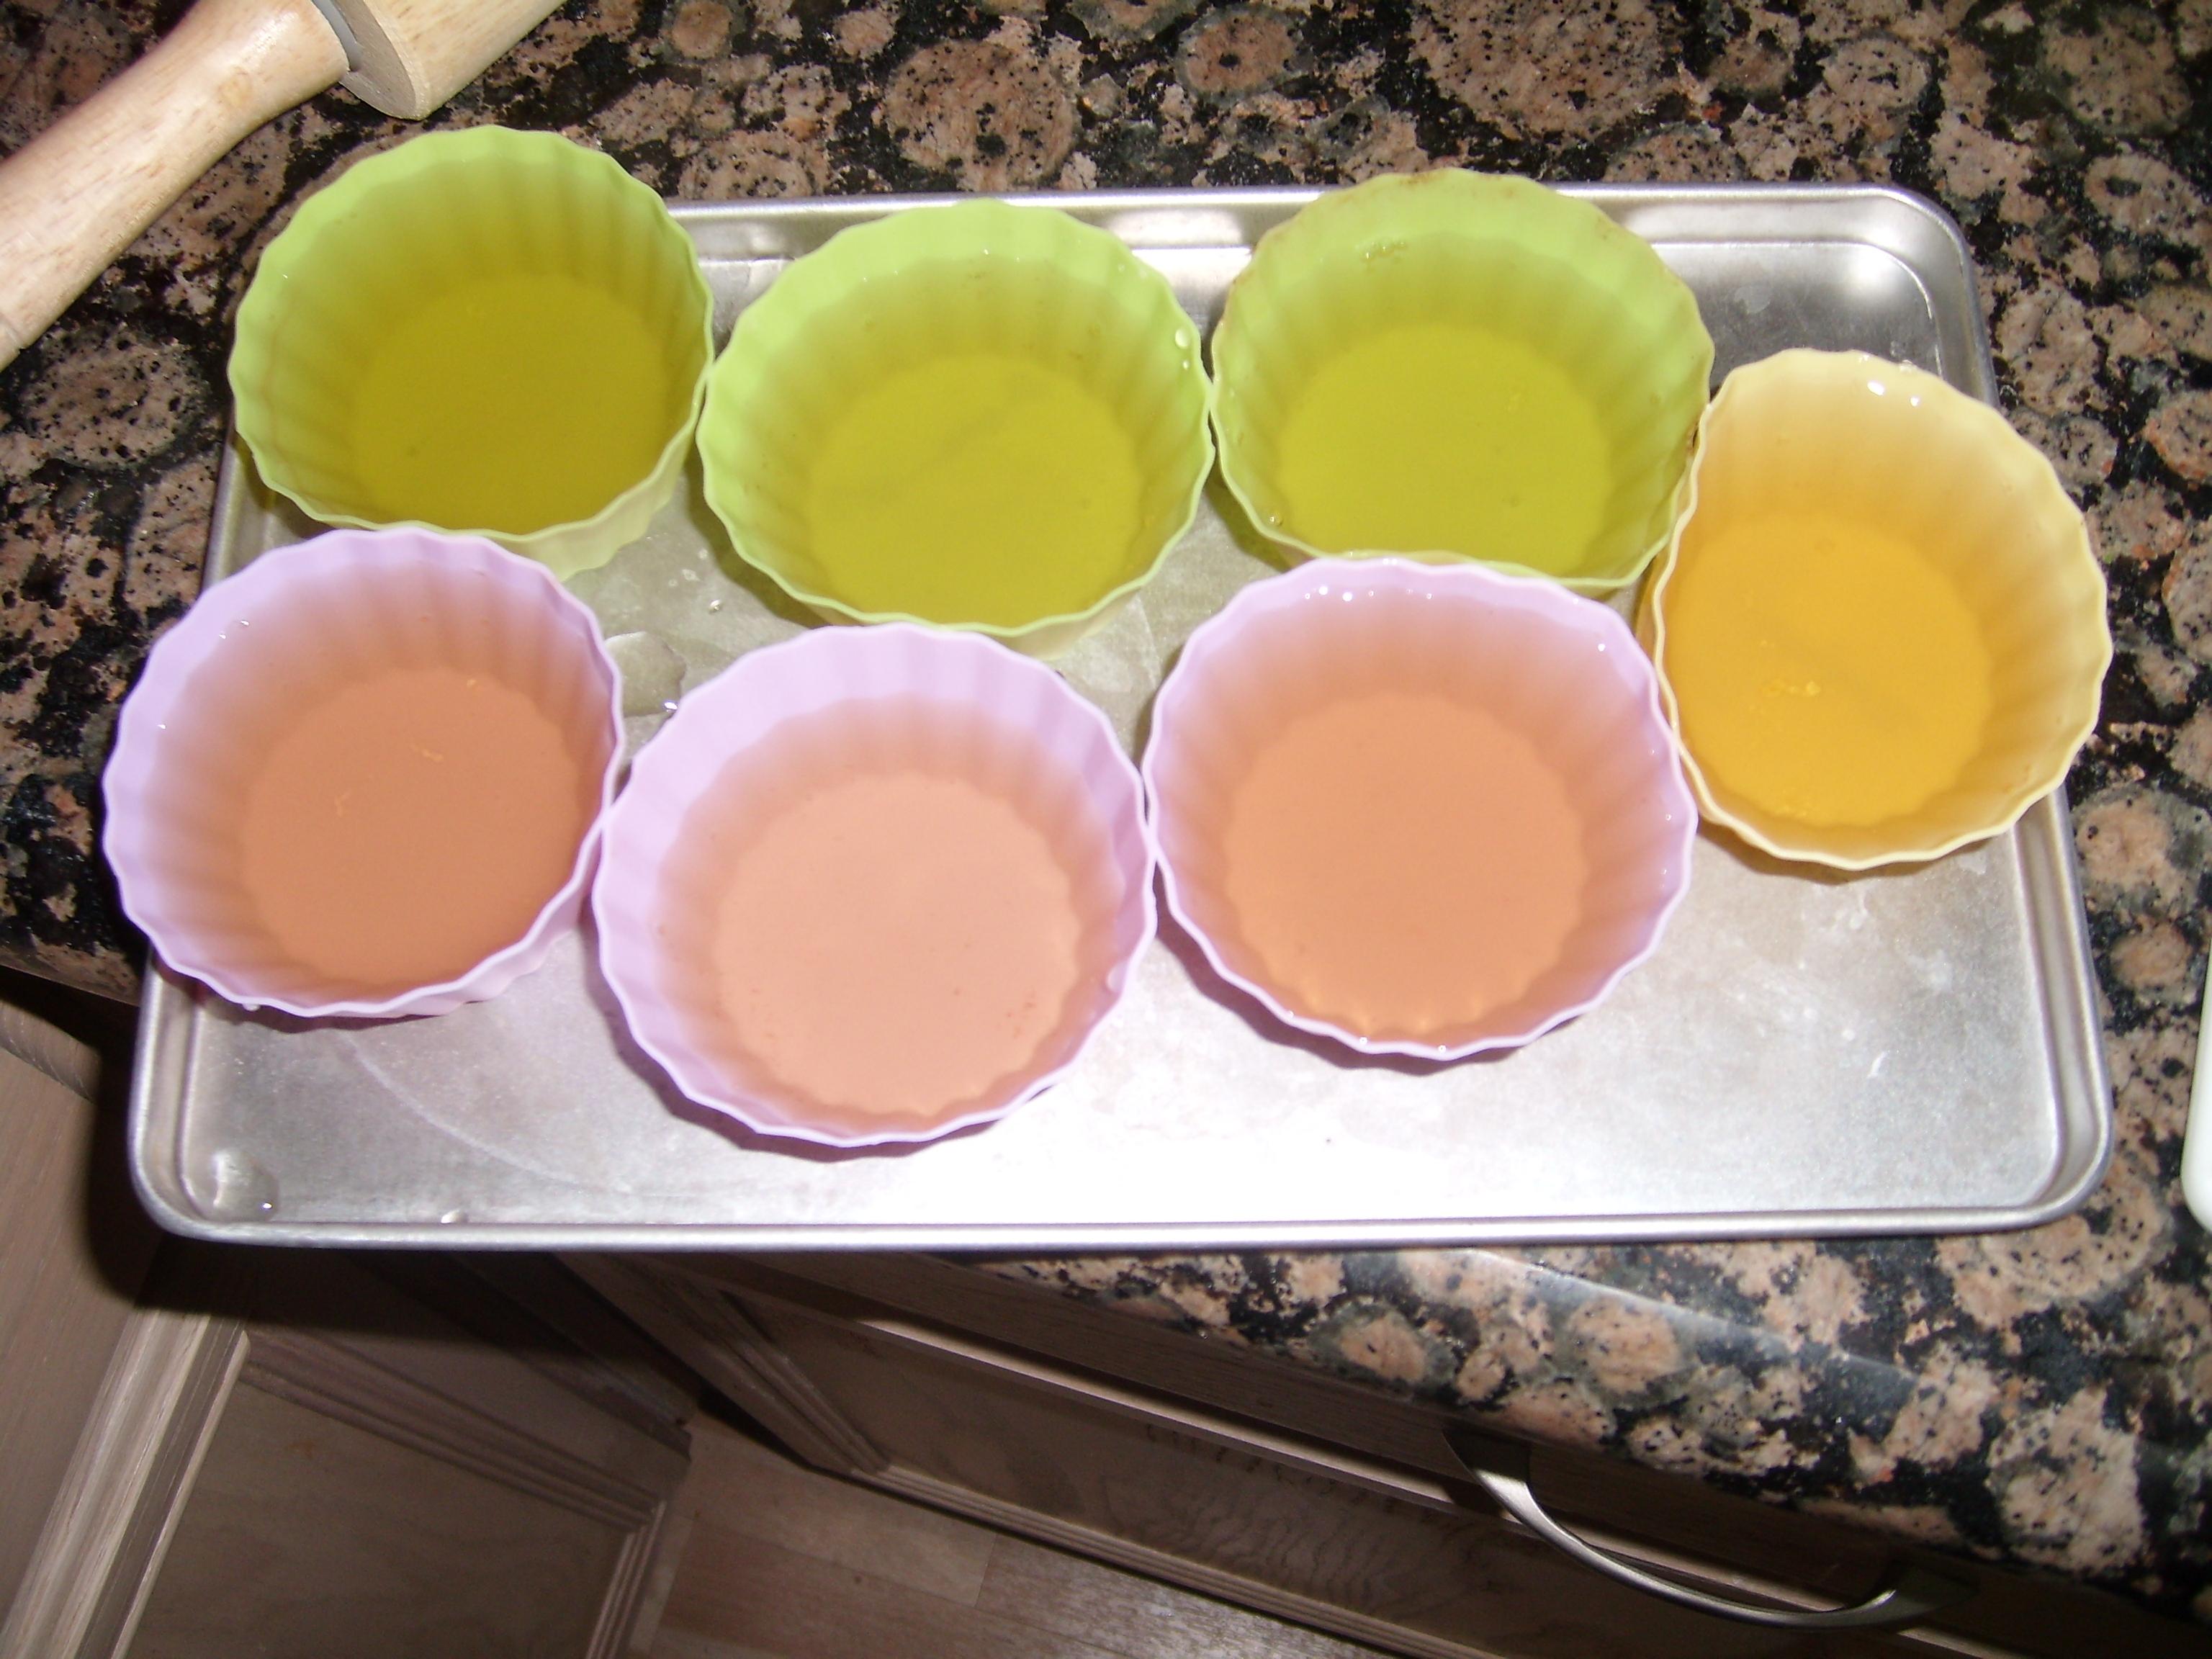 Green tea flavored 'jello' style gelatin dessert